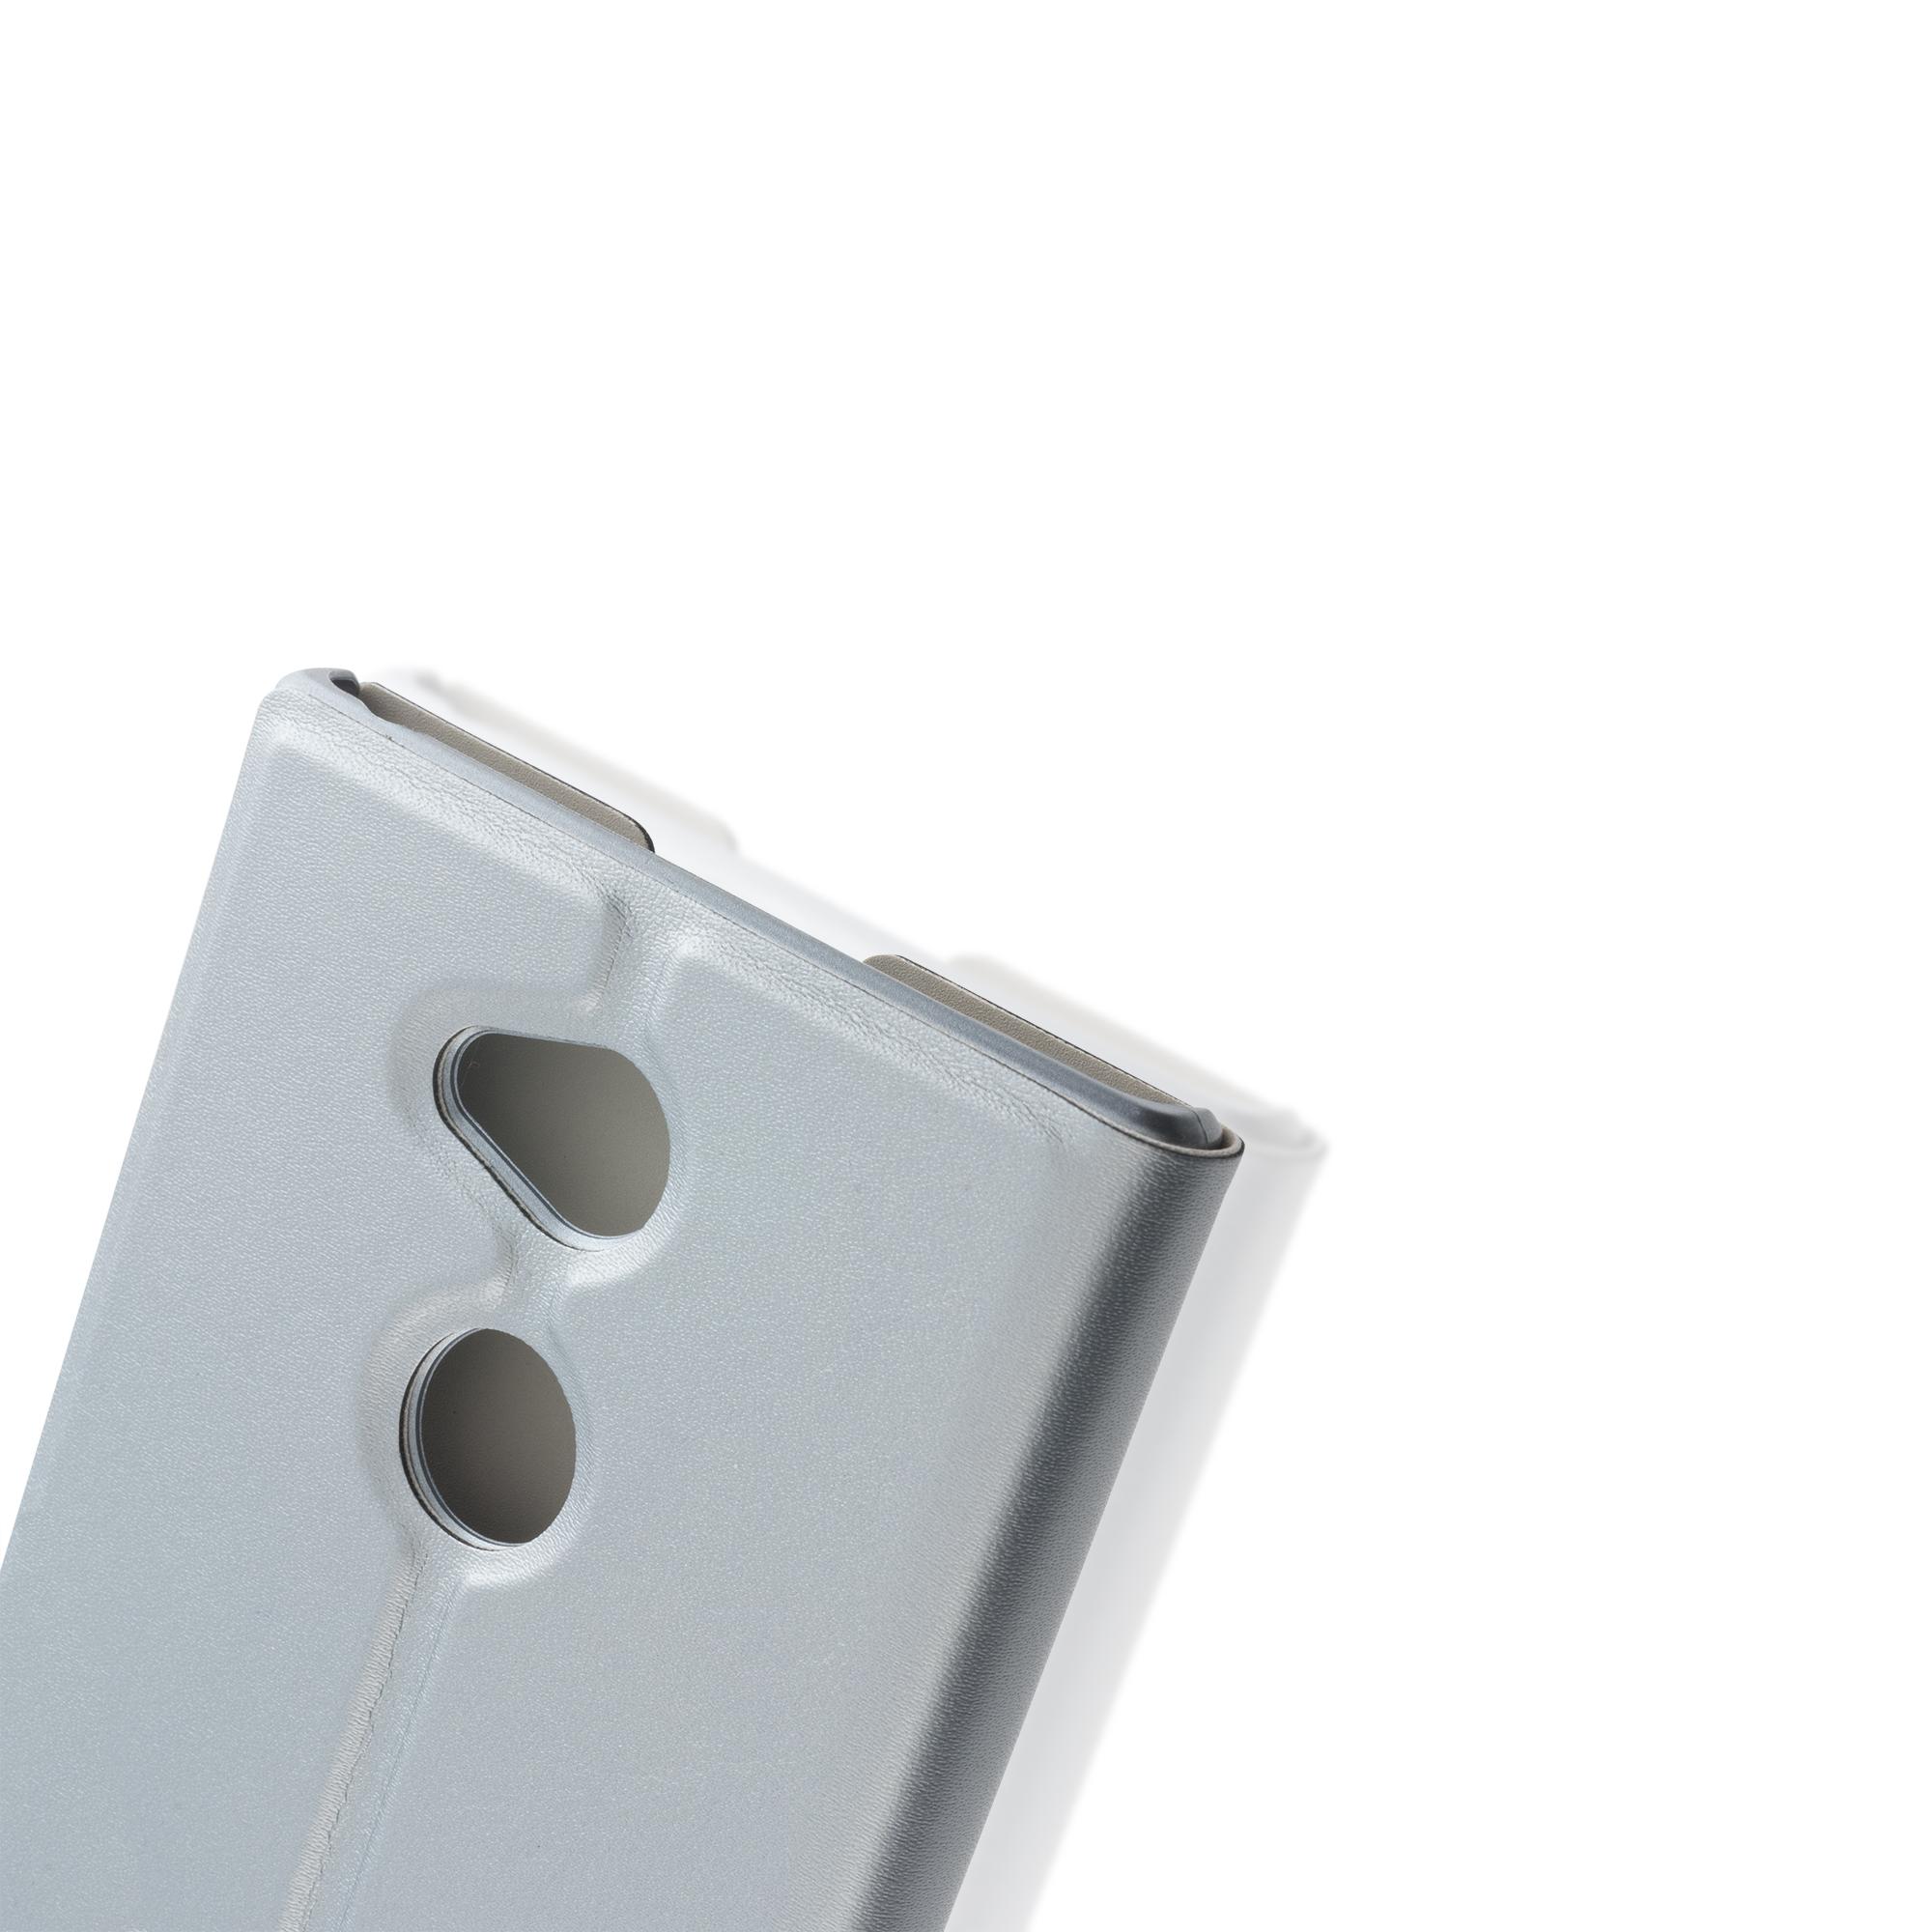 Купить чехол для Xperia XA2 Ultra серебристый в Sony Centre Воронеж